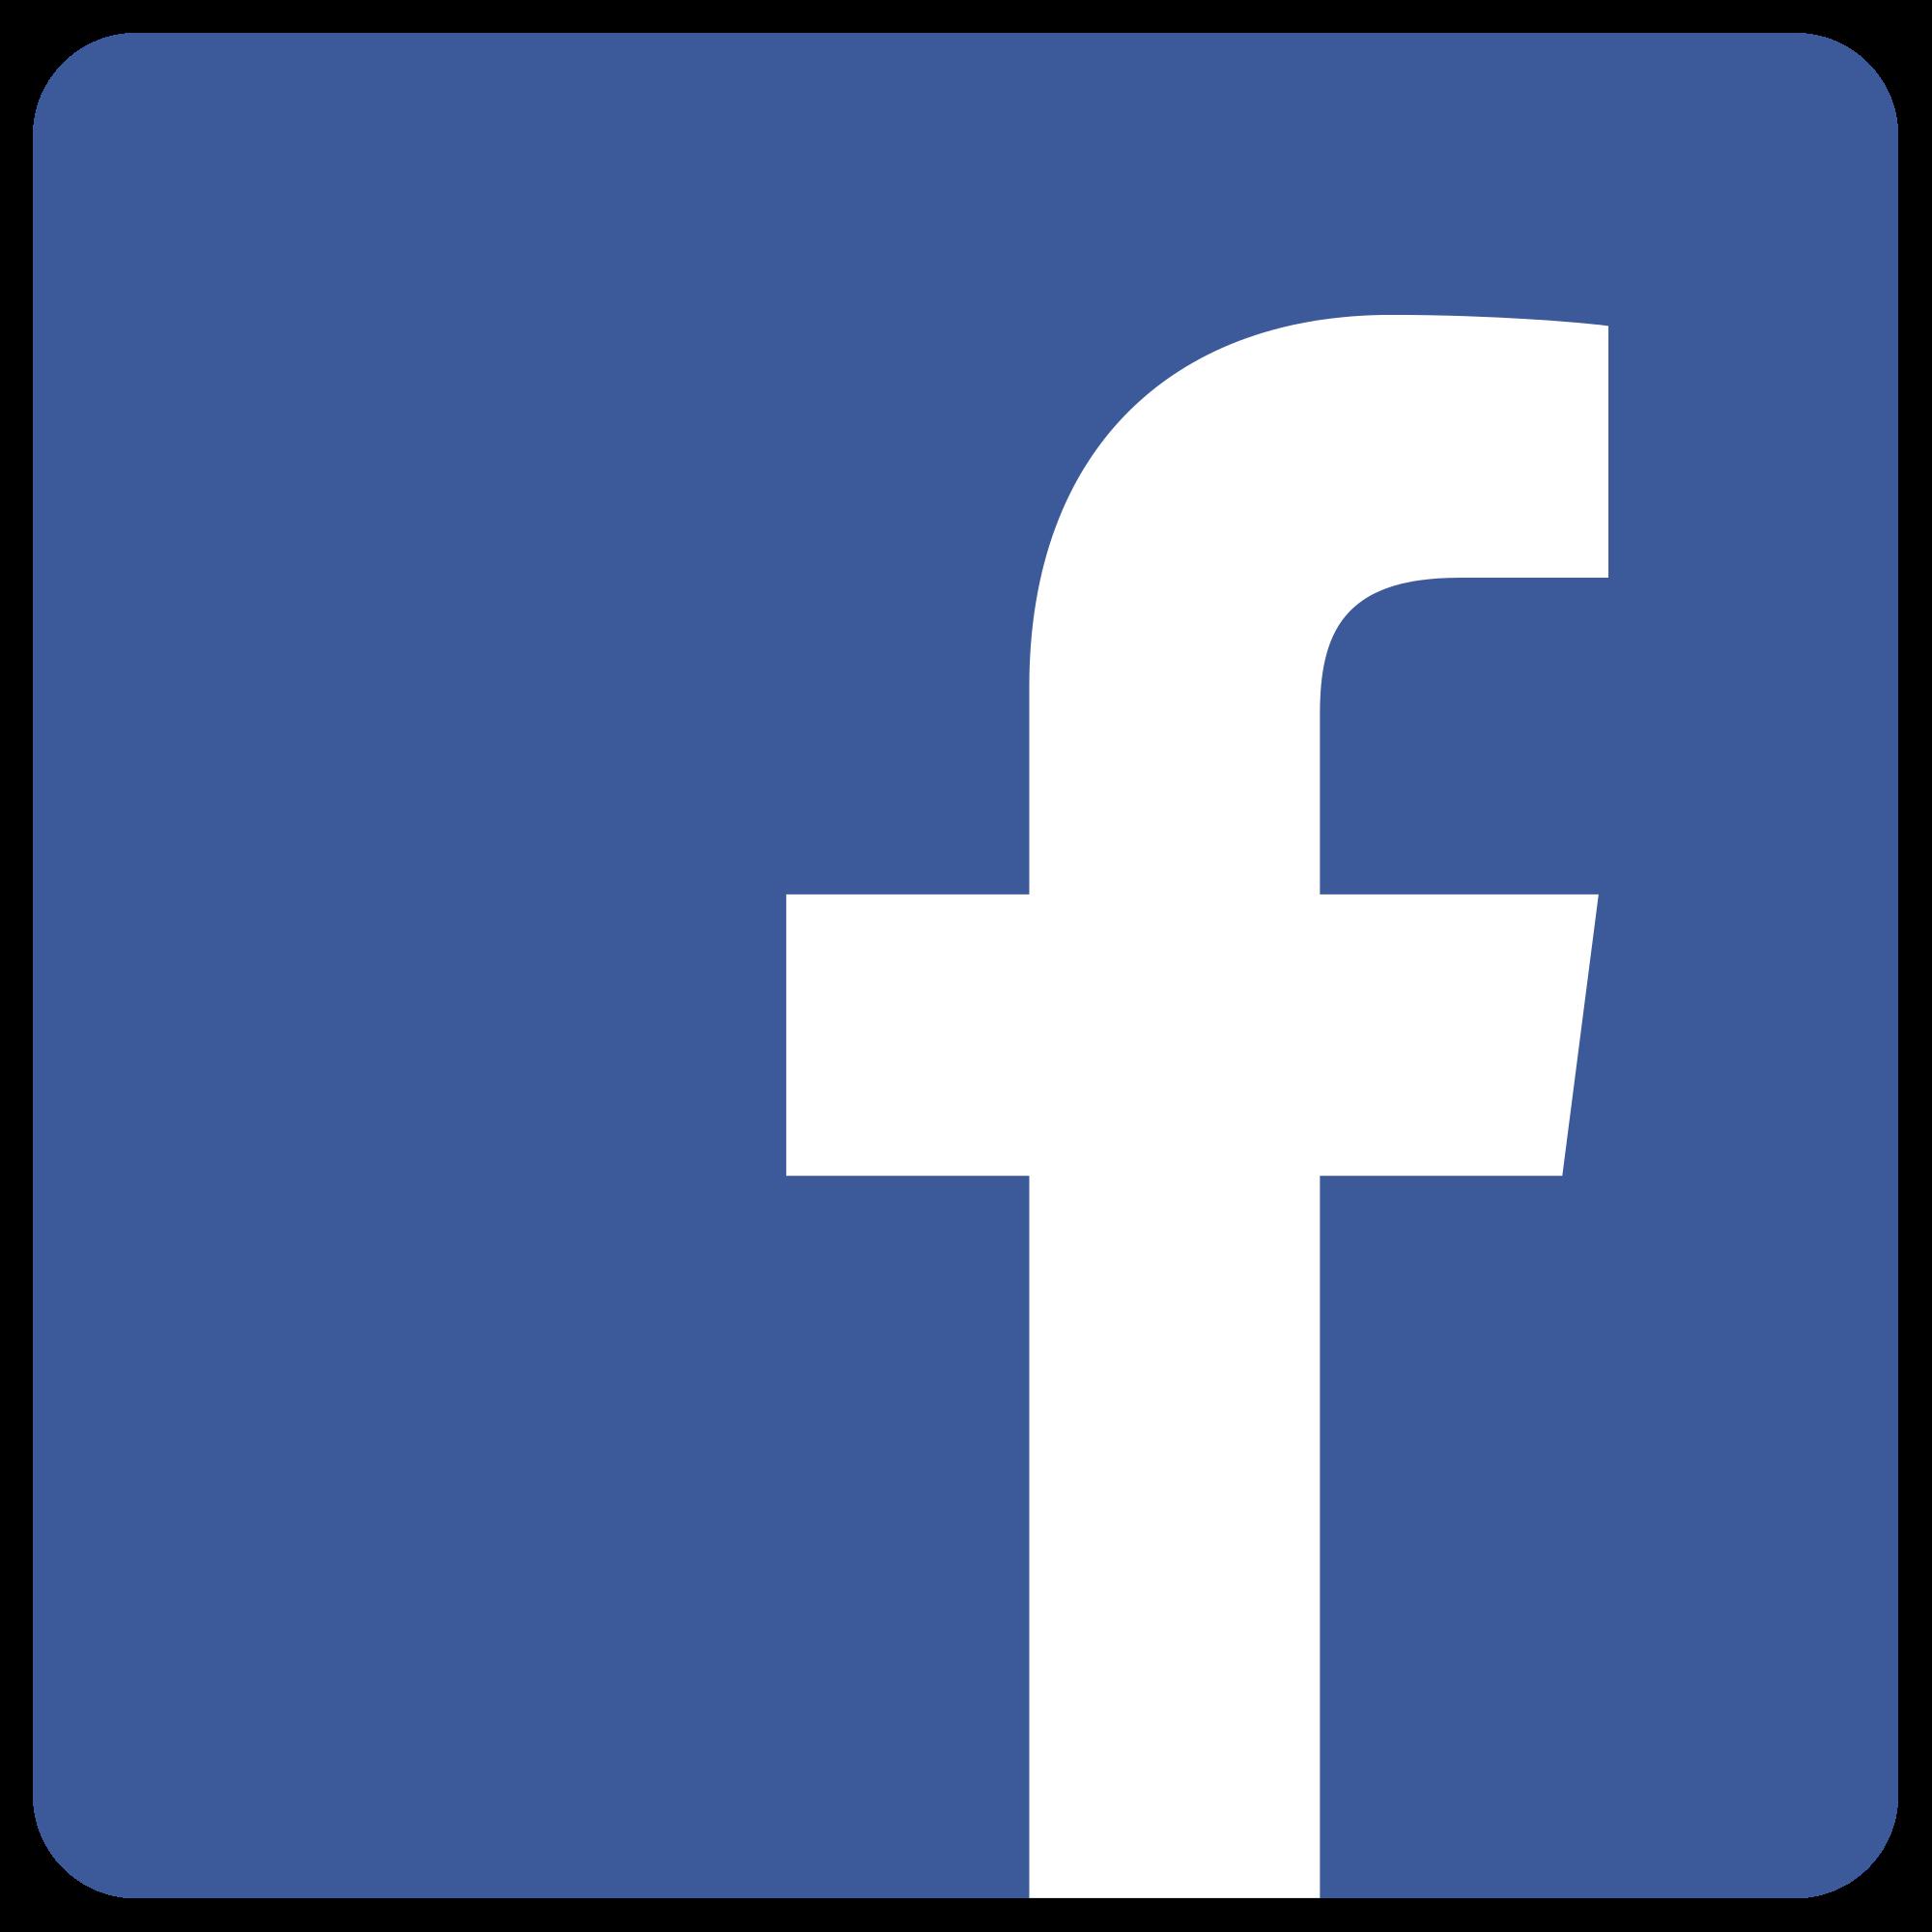 On Facebook?